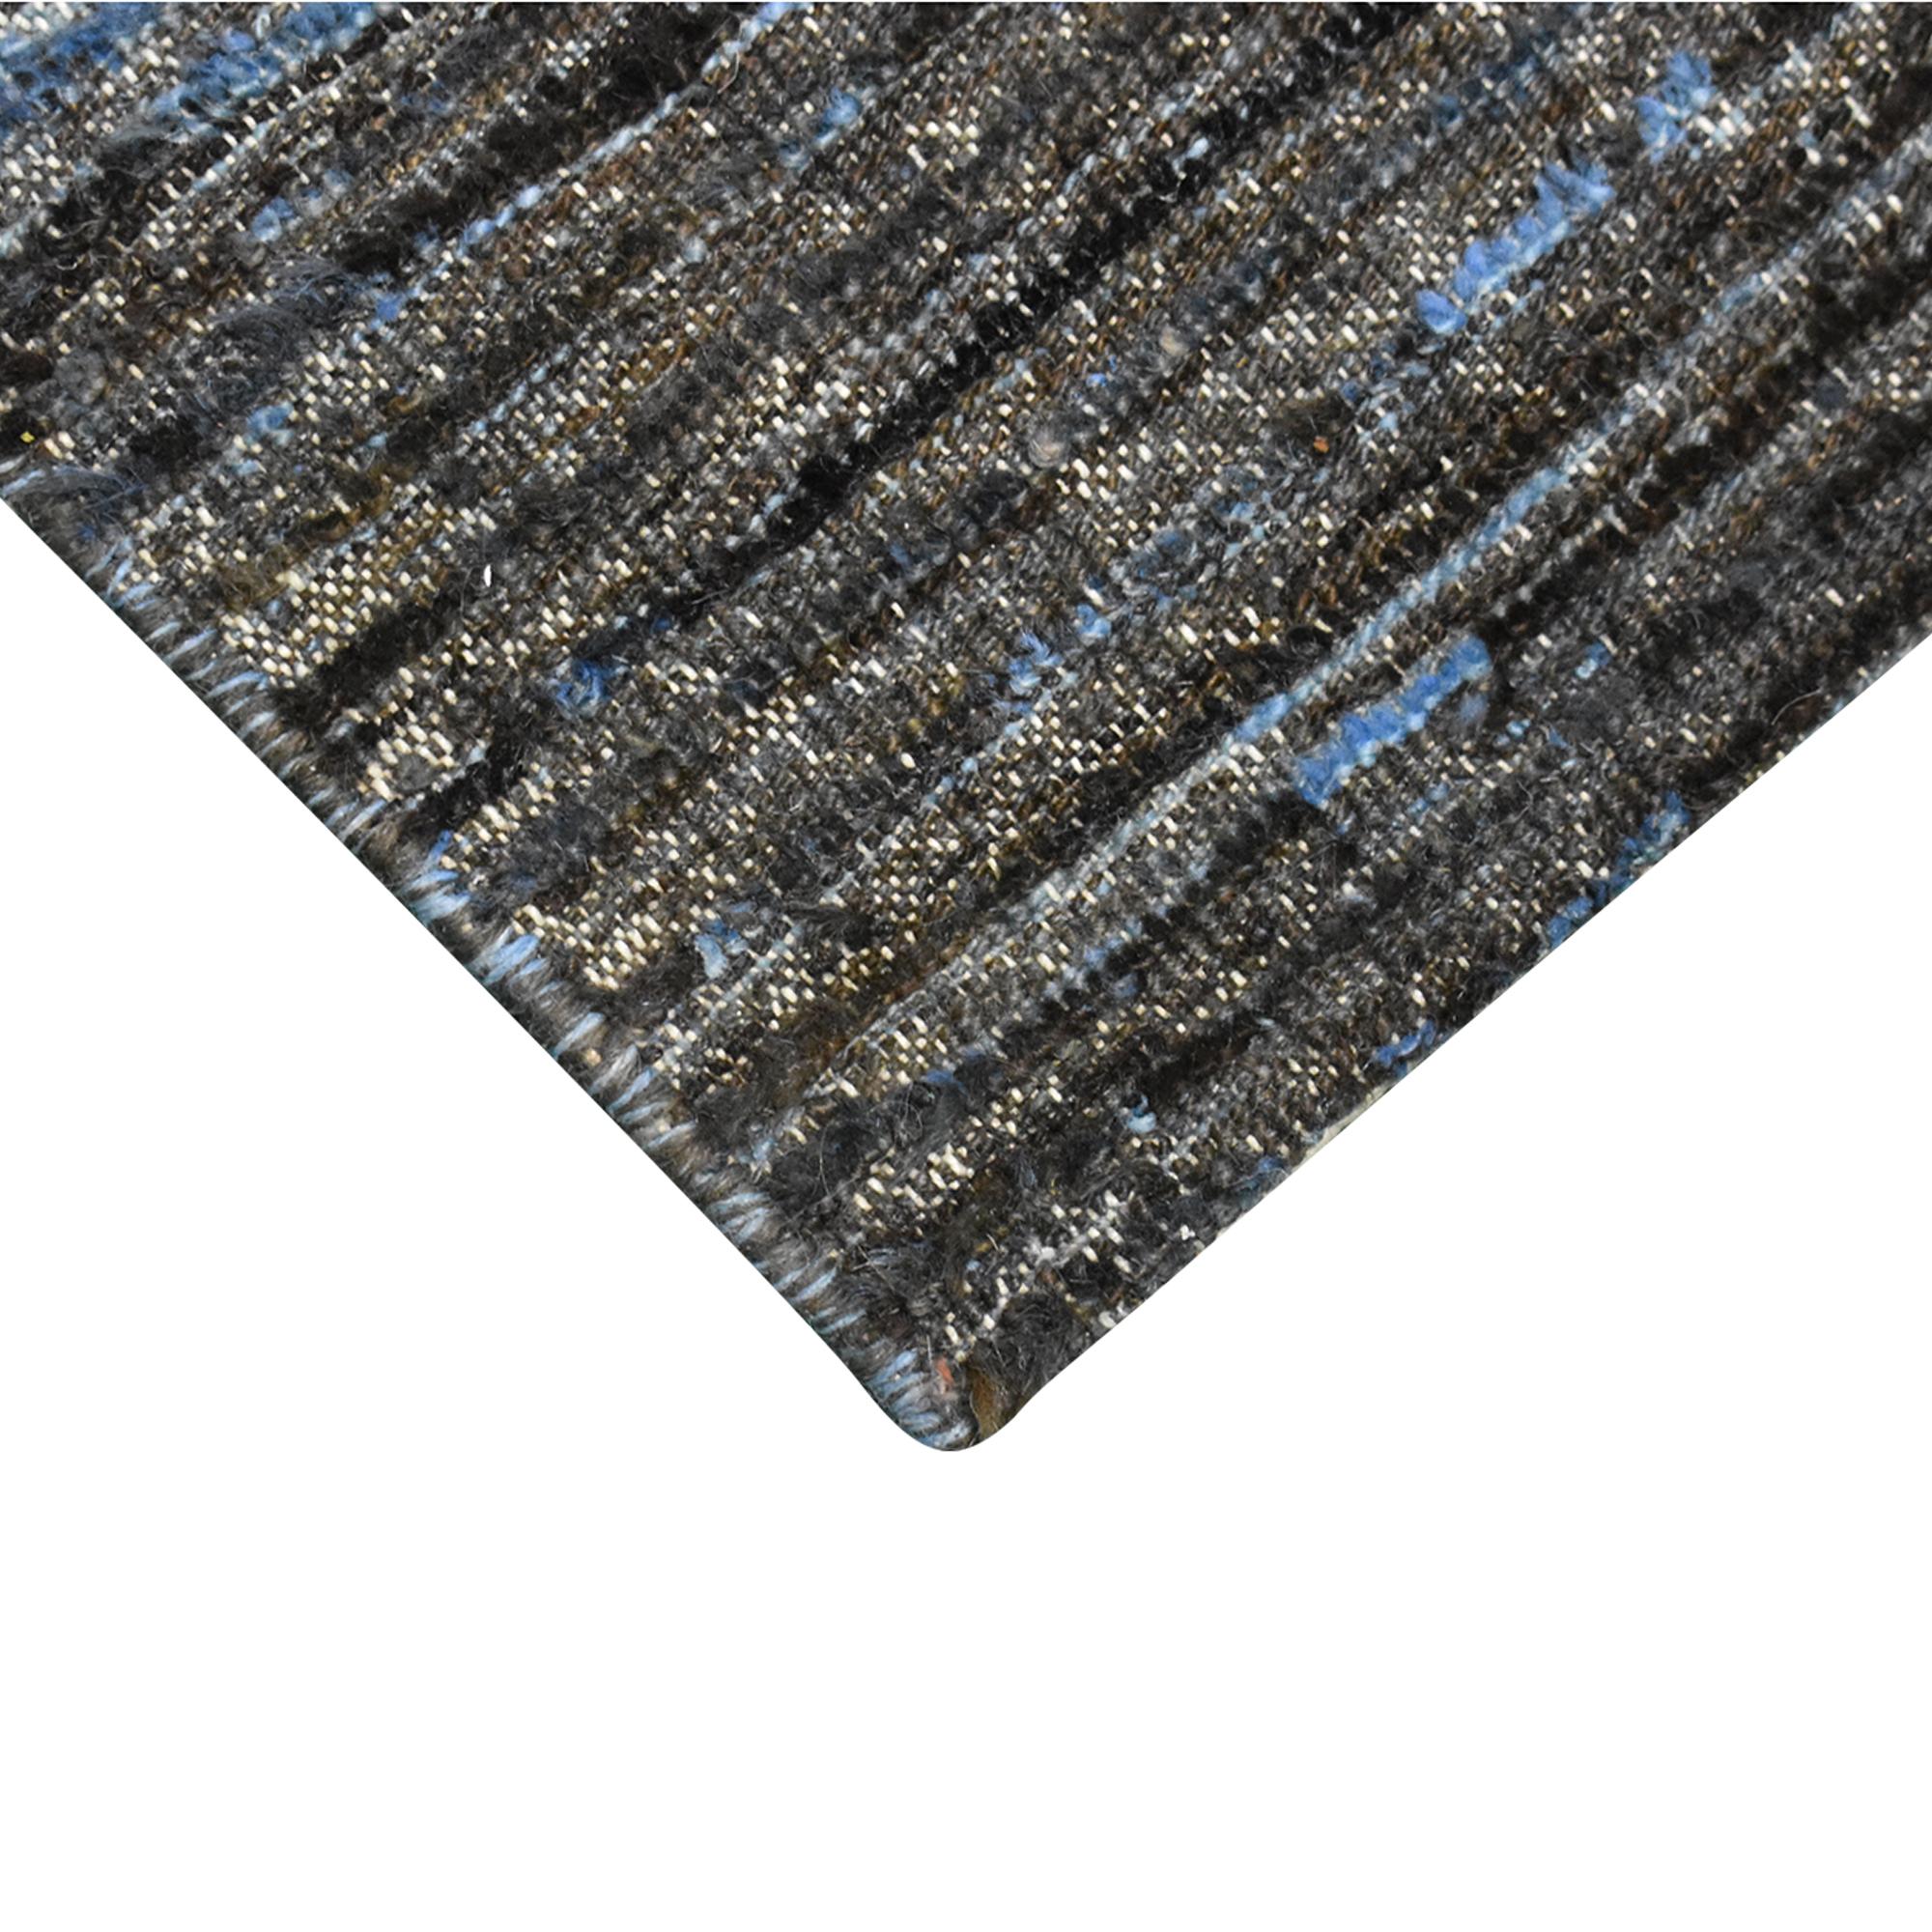 ABC Carpet & Home ABC Carpet & Home Area Rug Rugs